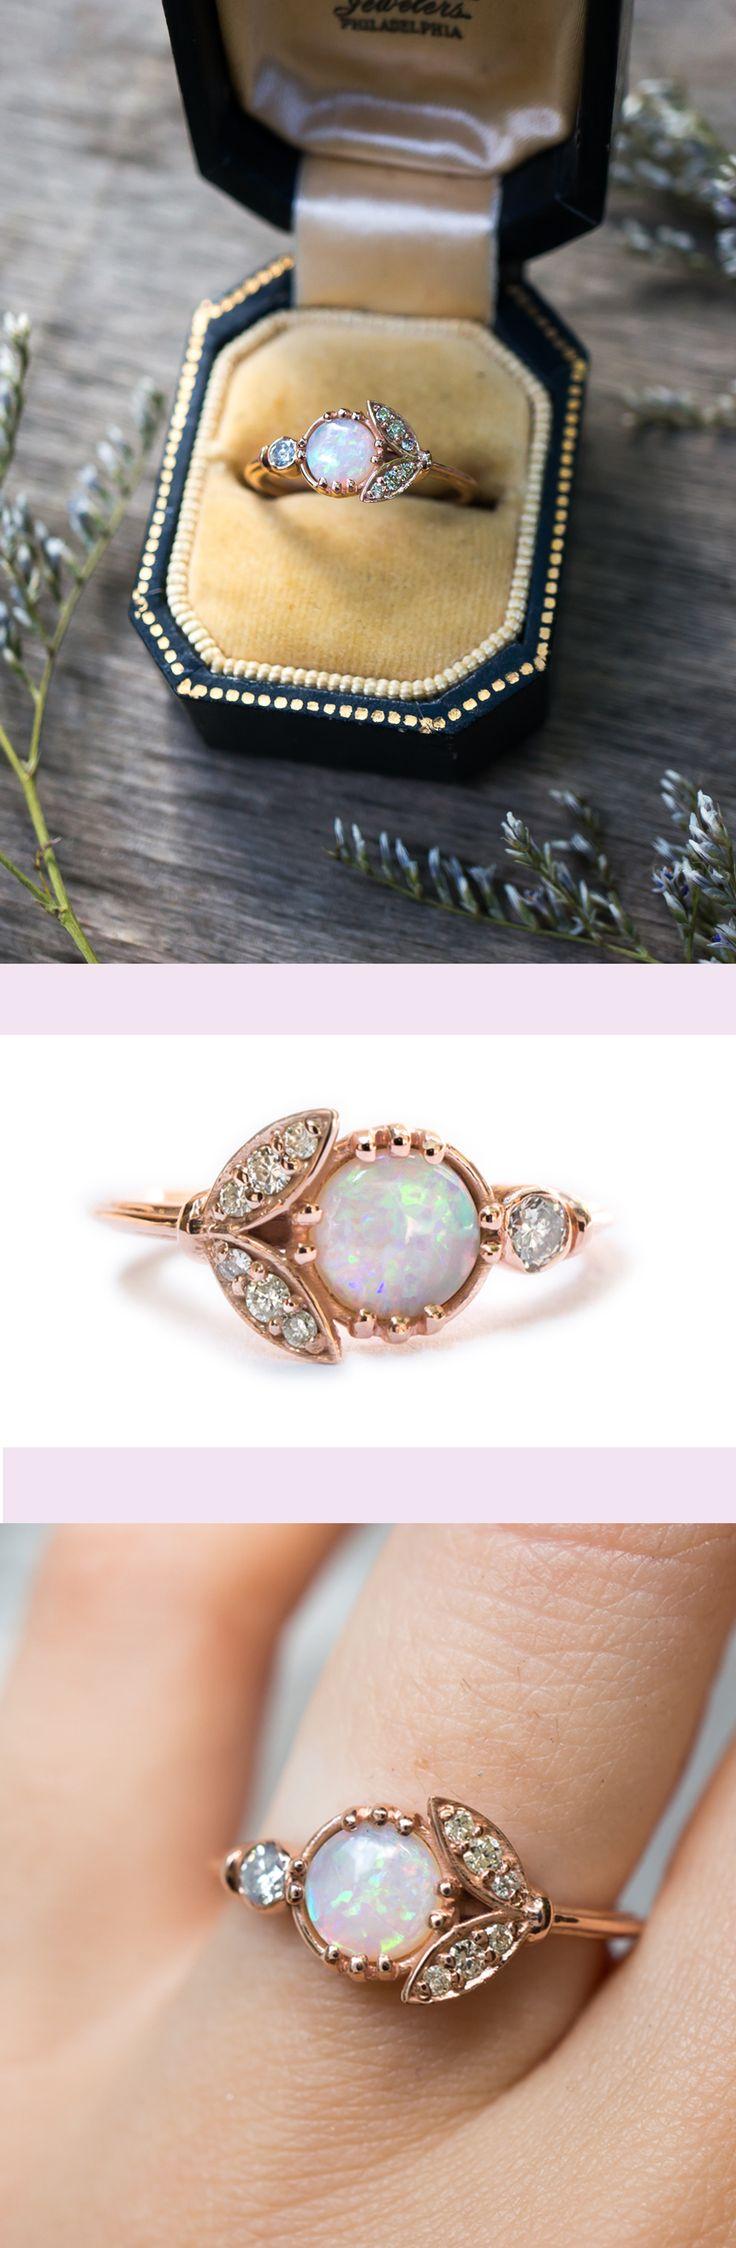 S.Kind&Co。独特的蛋白石订婚戒指